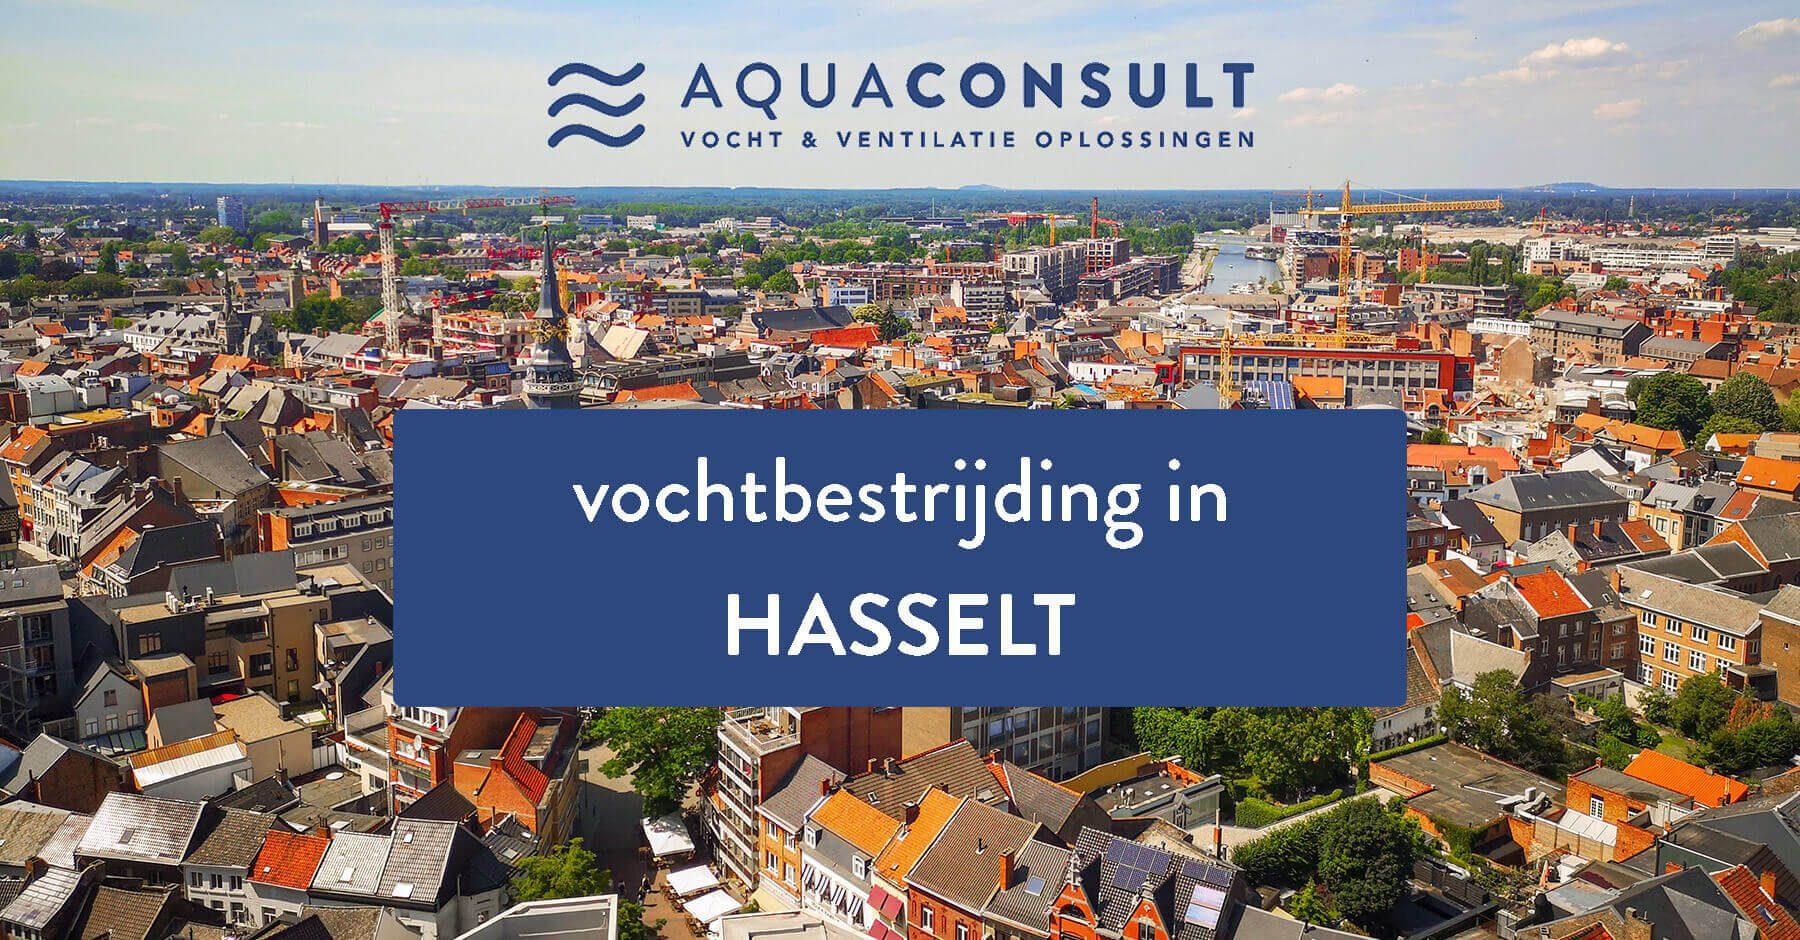 Vochtbestrijding in Hasselt